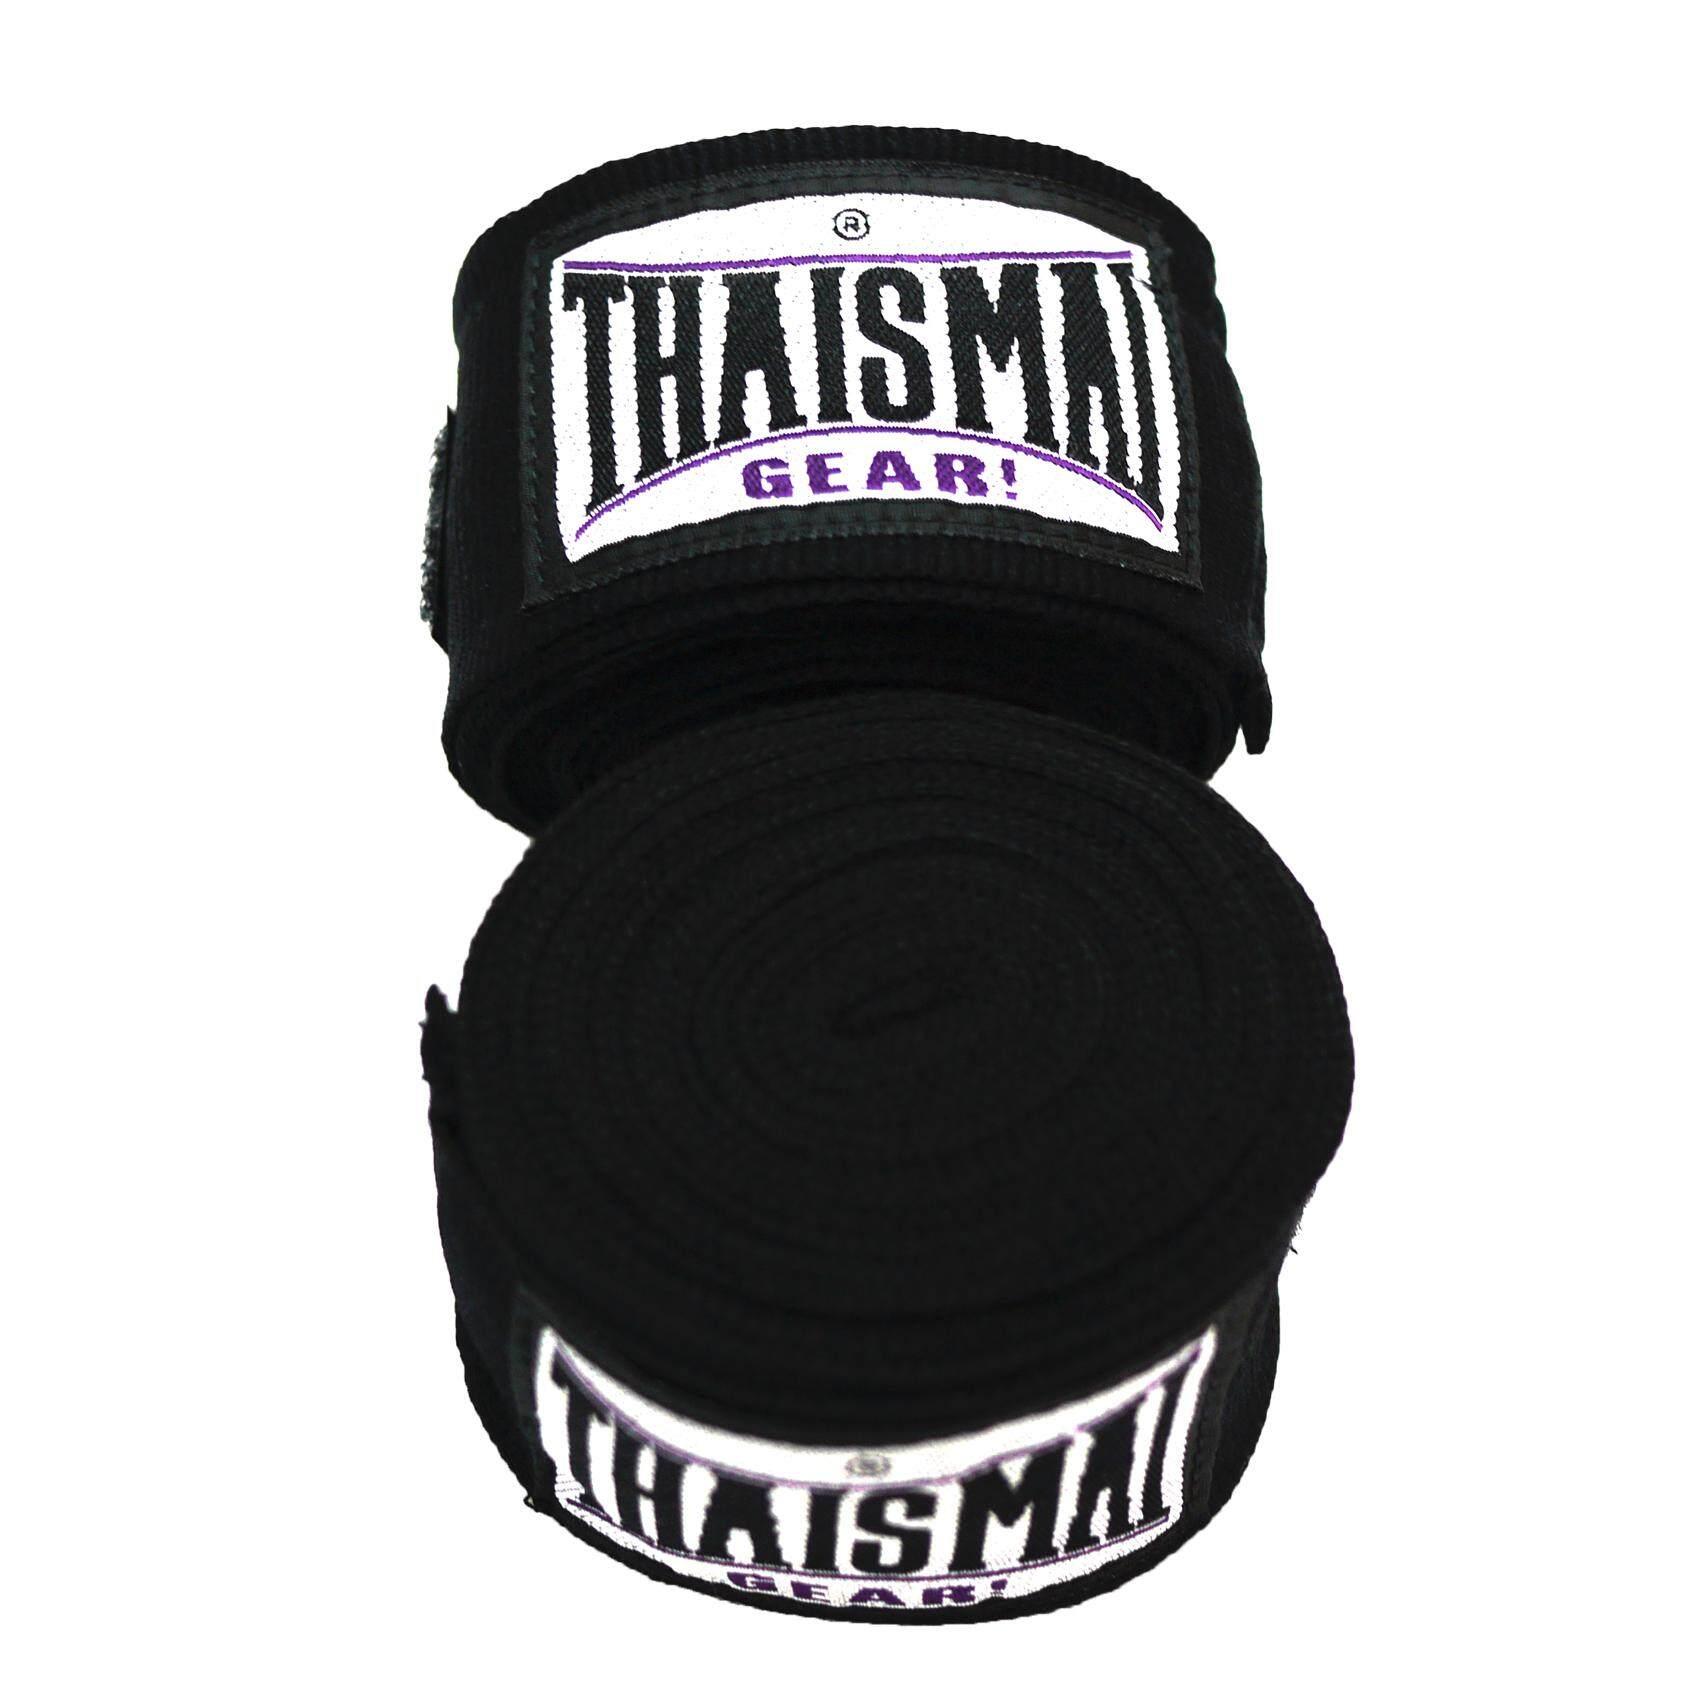 Thaismai ผ้าพันมือซ้อมมวย Hand Wraps Hw-7003 4.5 M.long (black) By Thaifightpro.